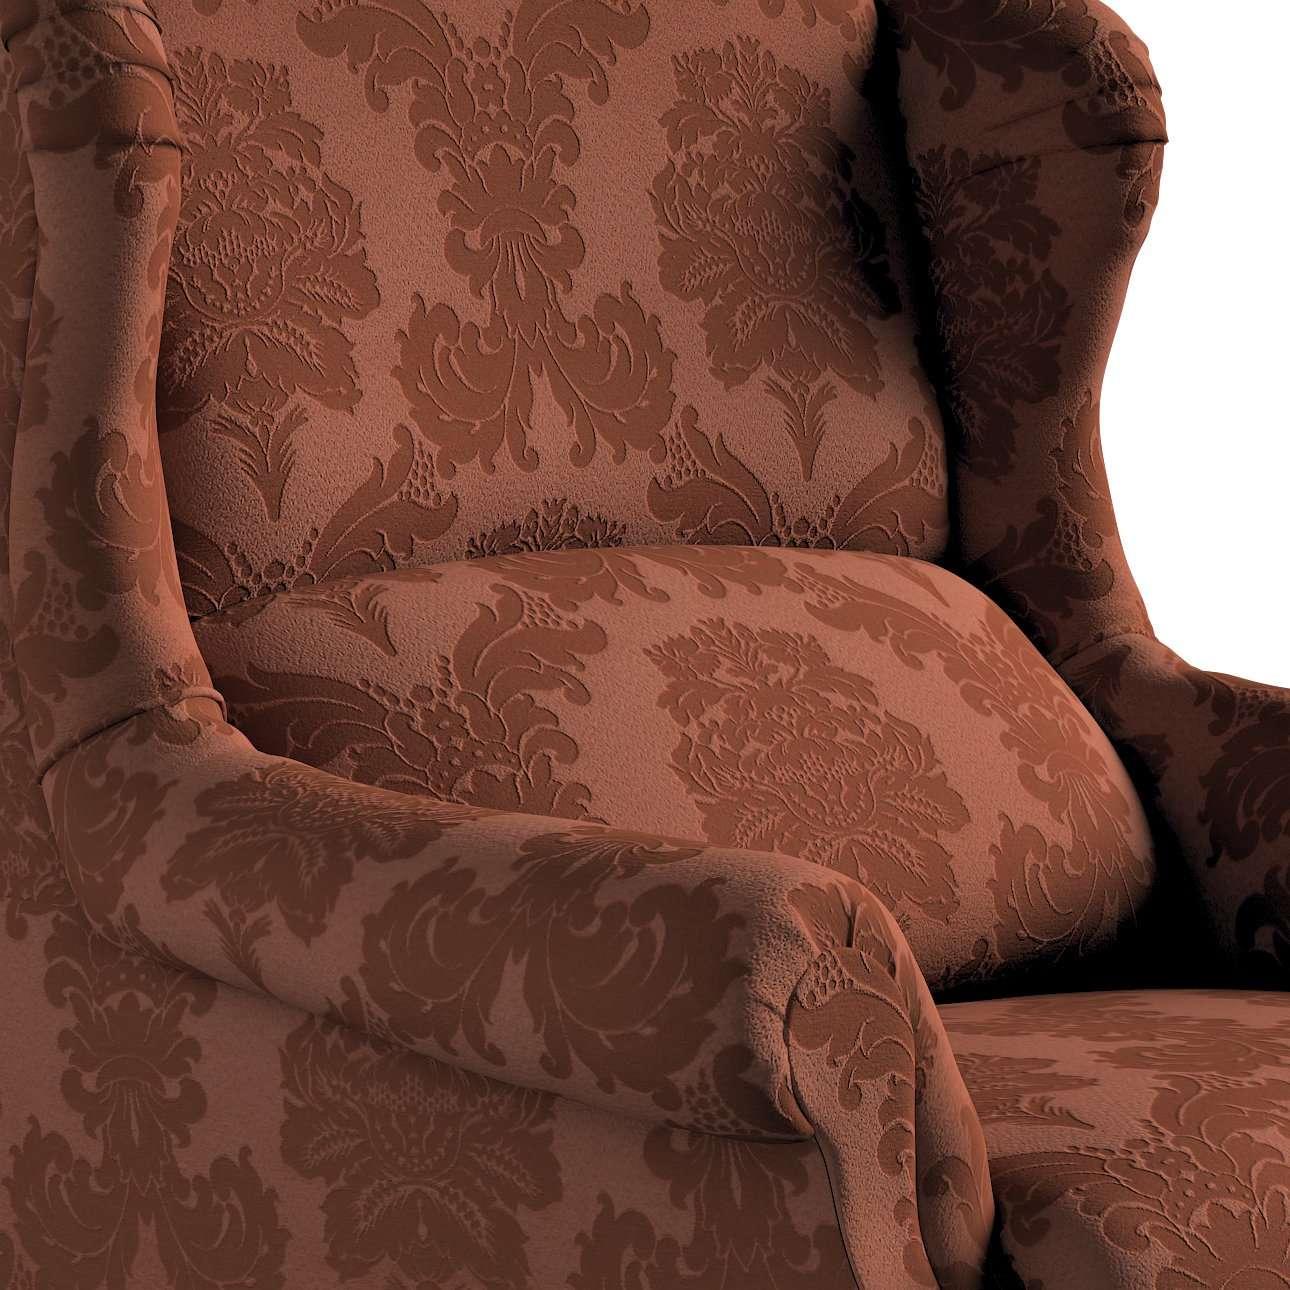 Fotel Unique w kolekcji Damasco, tkanina: 613-88